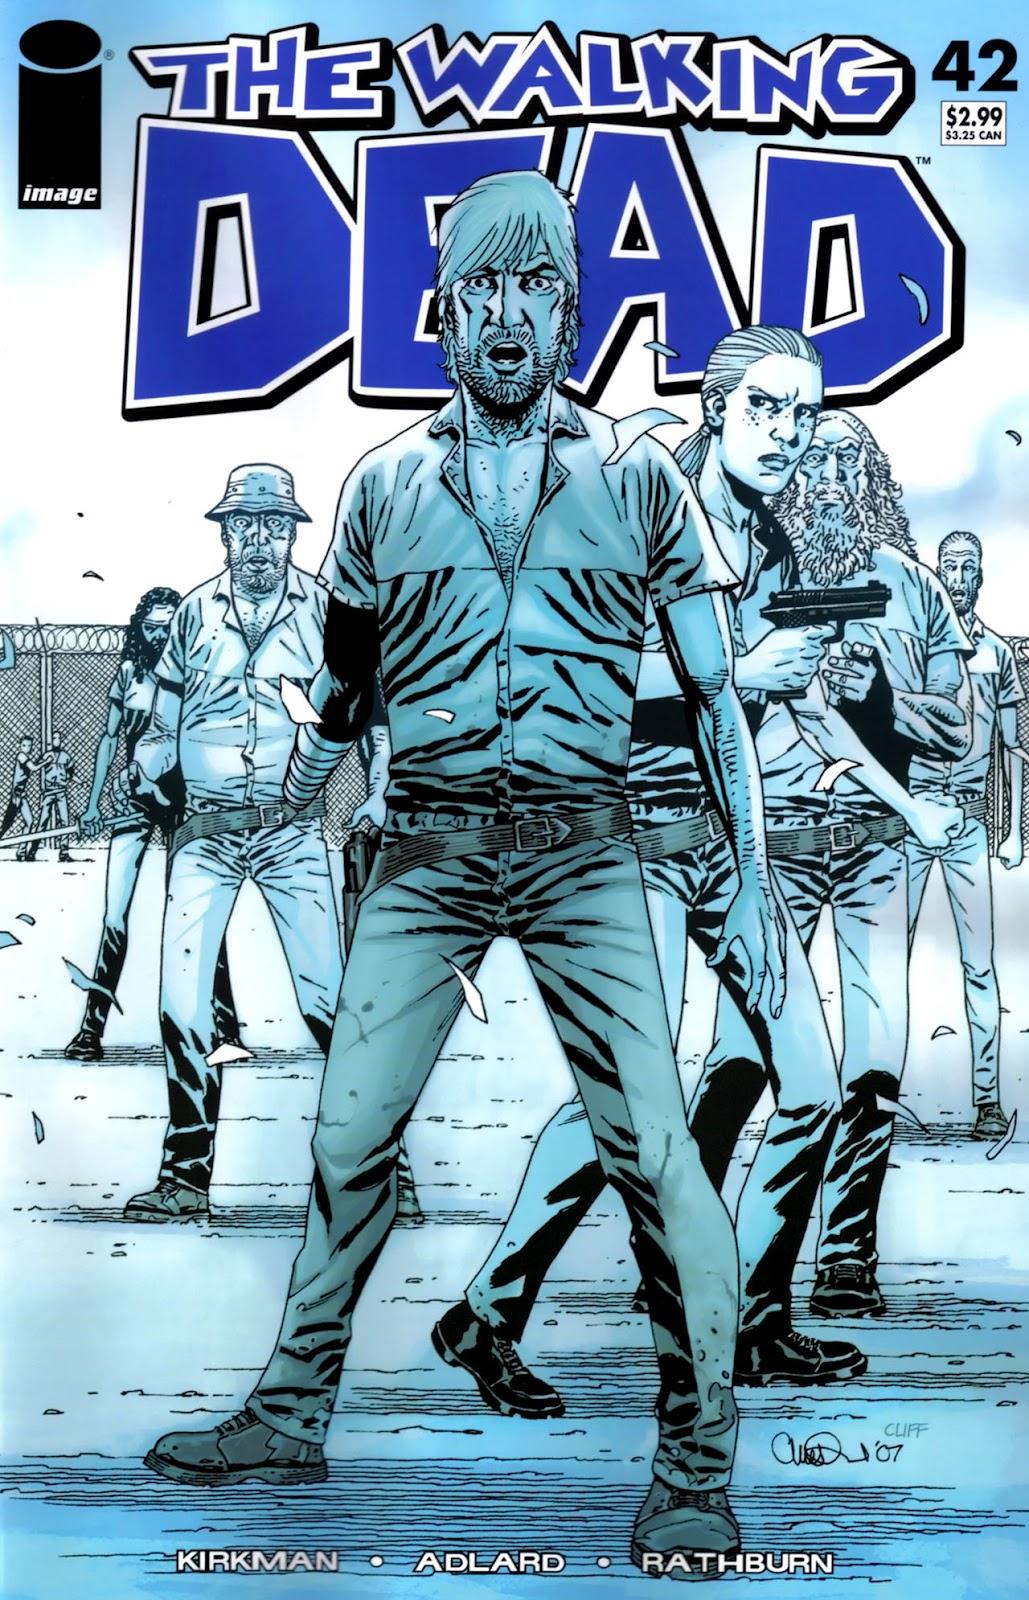 http://4.bp.blogspot.com/-A9GlXYeKG7U/T3RnUt0jhHI/AAAAAAAAGfA/RwN0n9Ja9s4/s1600/The+Walking+Dead+42+-+Capa+-+NED.jpg